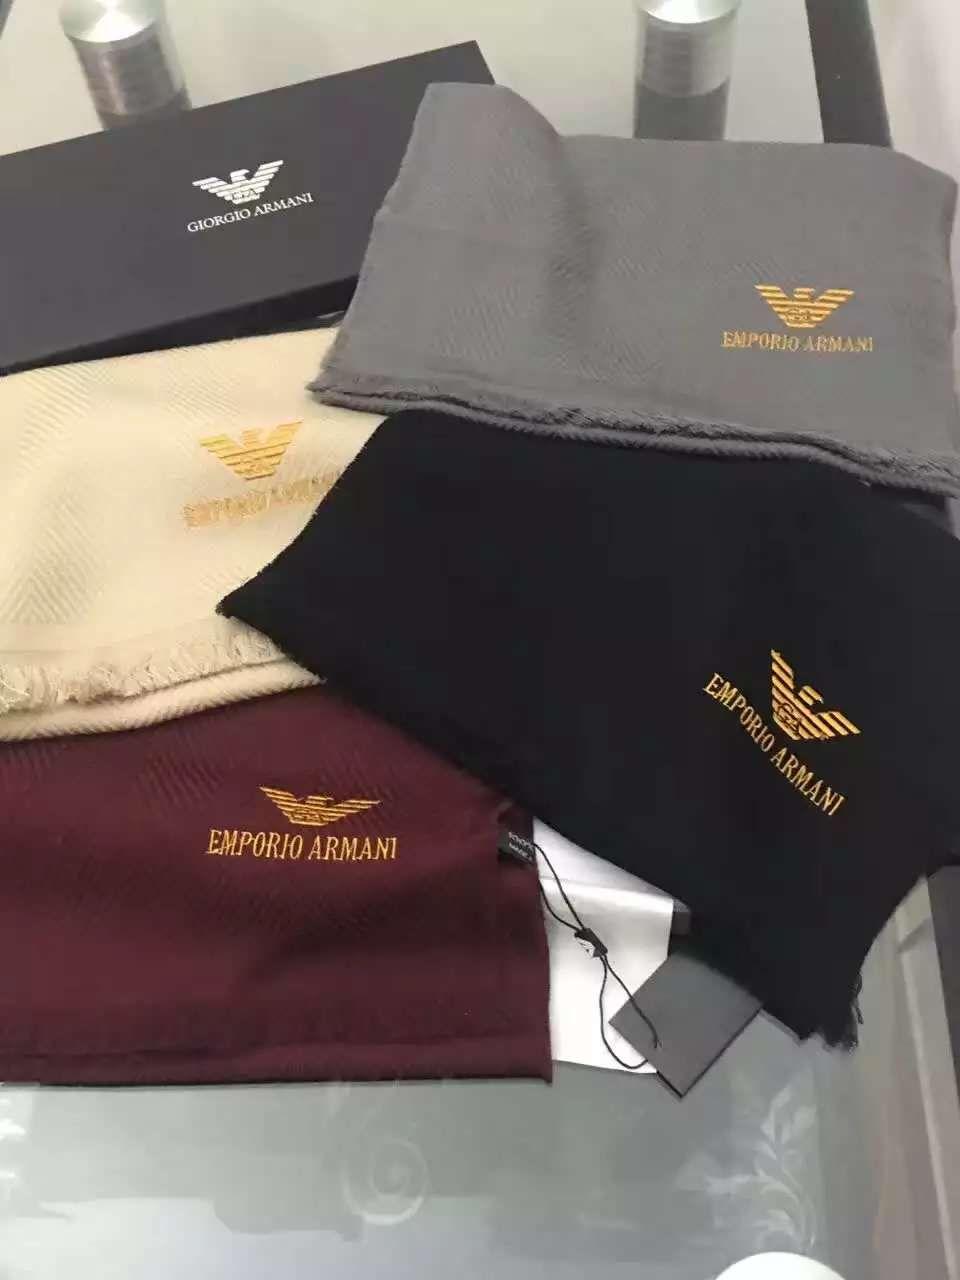 armani Scarf, ID : 57416(FORSALE:a@yybags.com), ladies bags, leather handbags on sale, daypack, backpack shop, big backpacks, bag backpack, best designer handbags, women's leather handbags, brown briefcase, leather handbags, womens designer bags, handbags and purses, pink backpack, shop handbags, shop backpacks, man's briefcase #armaniScarf #armani #pocket #wallet